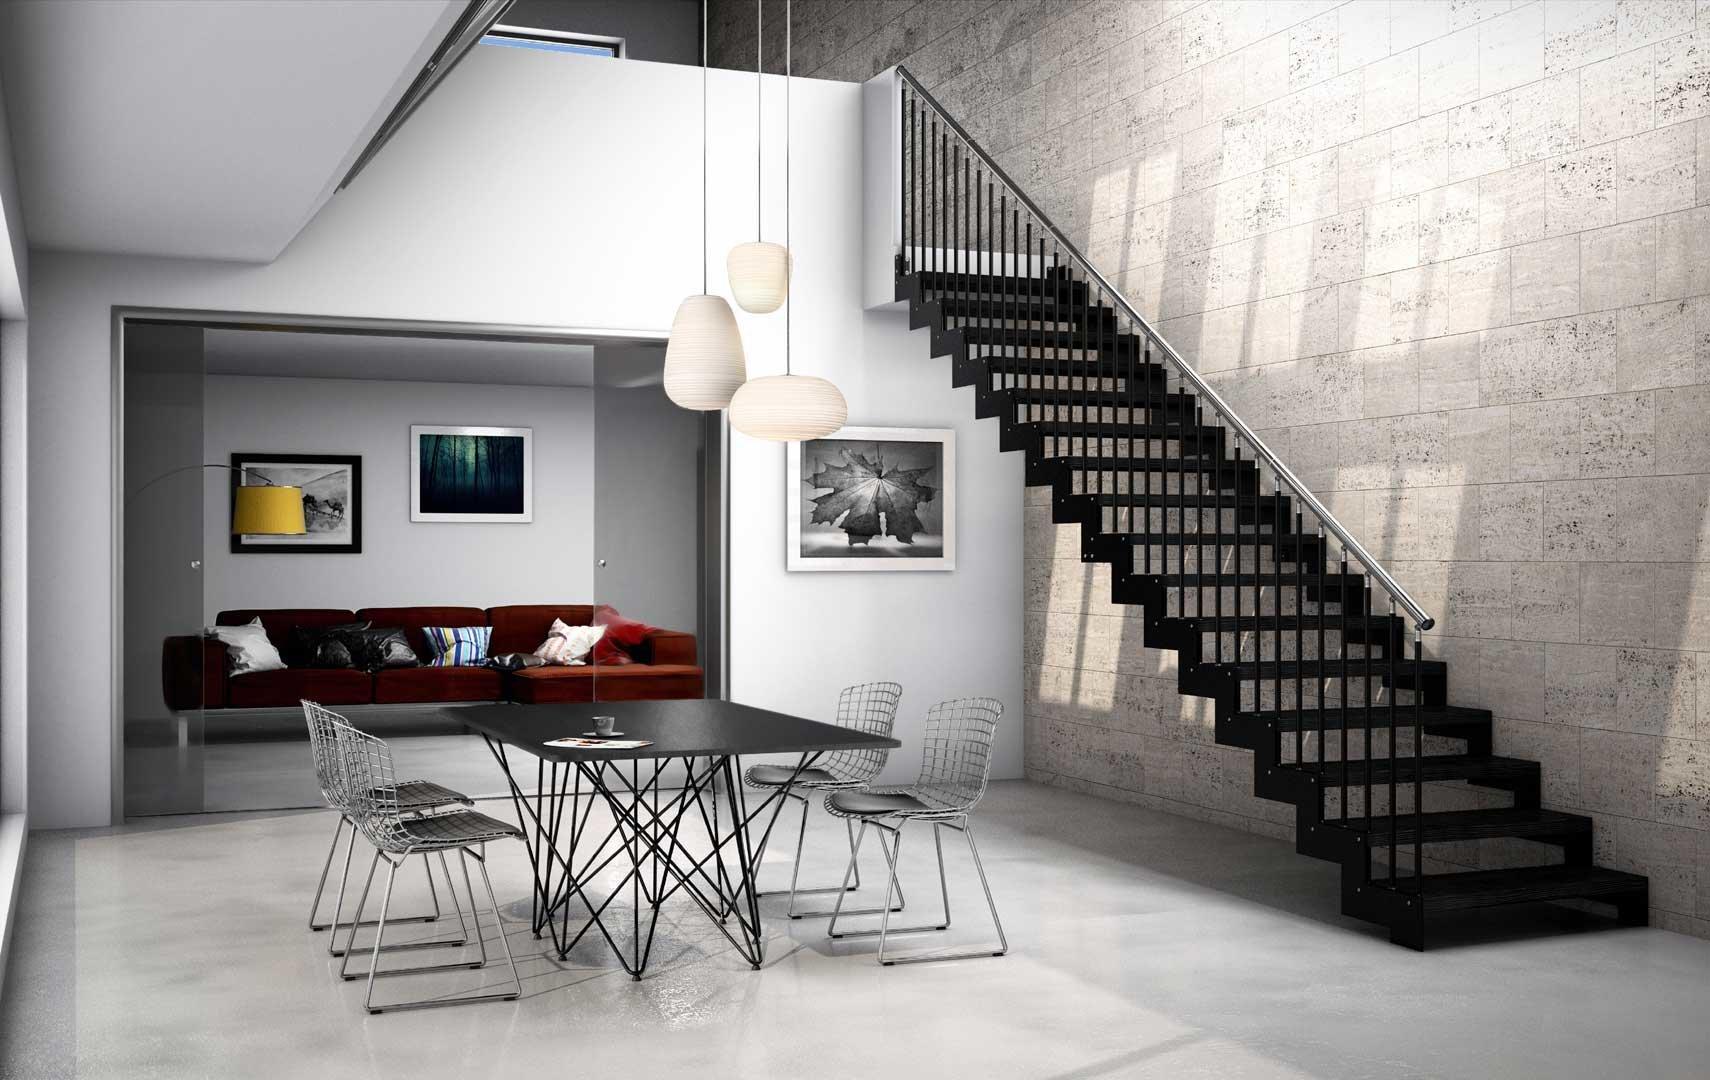 Stil_casa_belsito_cosenza_bbls_group_paviment_rivestimenti_arredo_scale_4